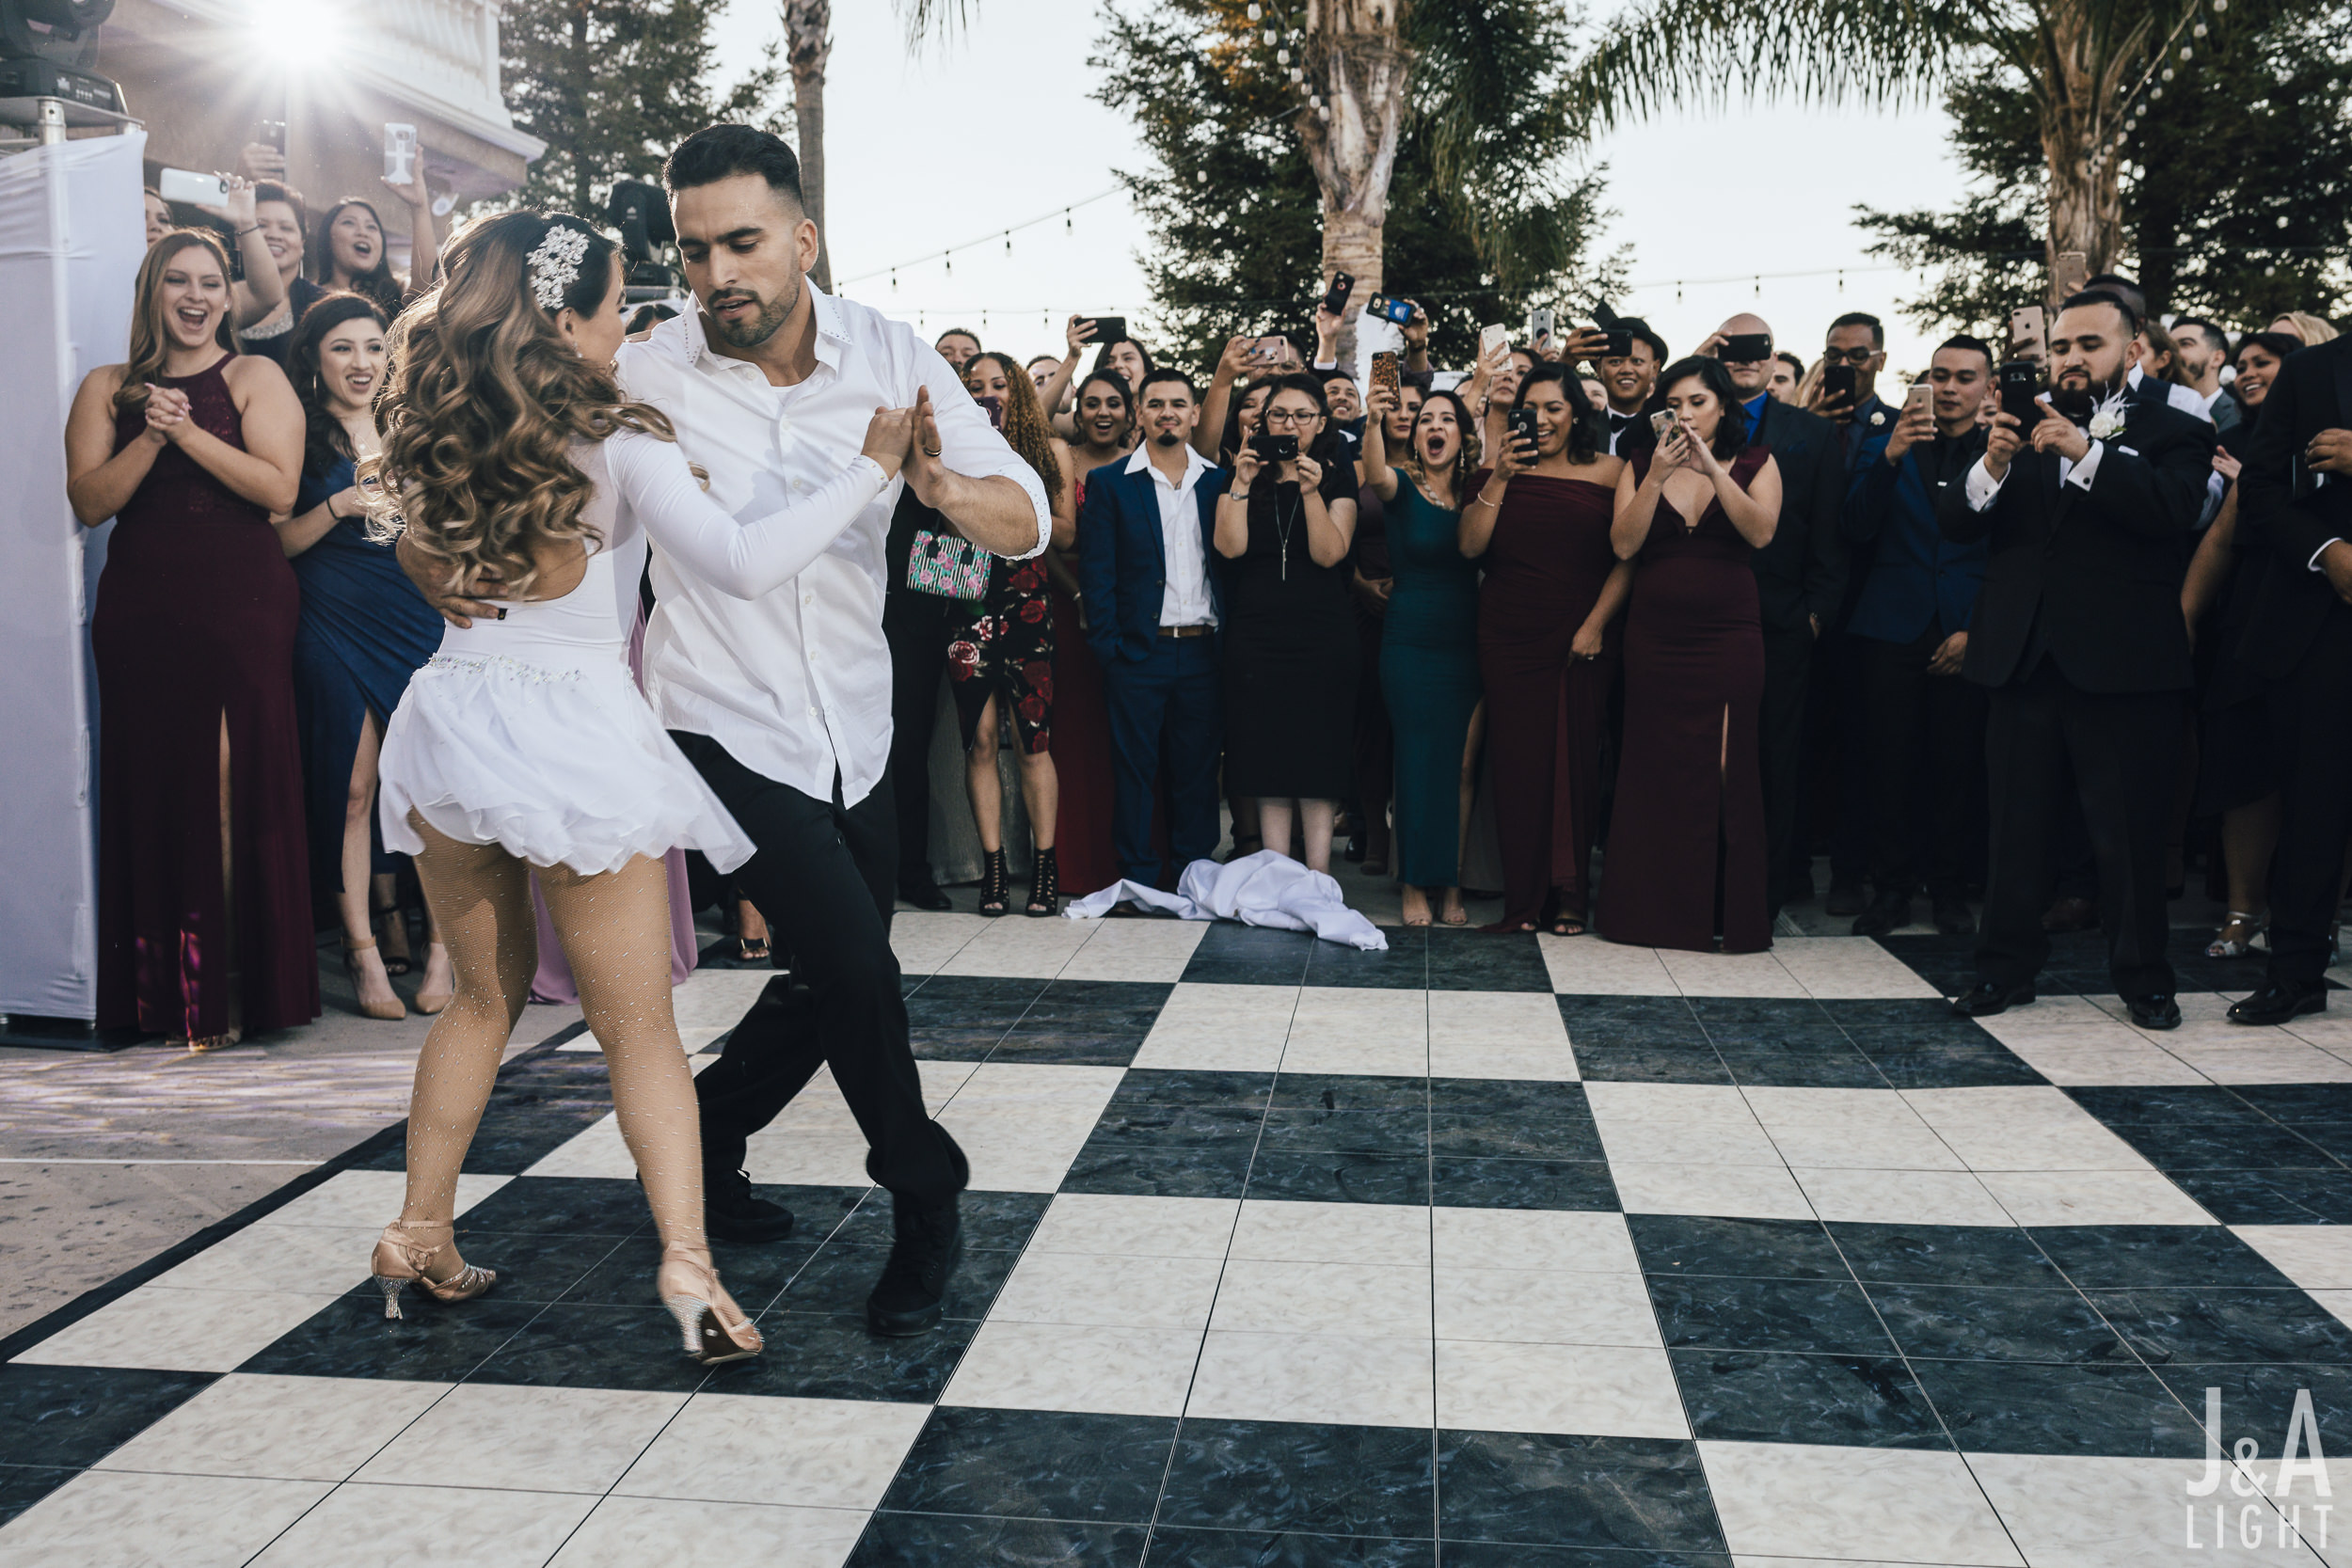 20171014-JanDan-LosBanos-GlassMansion-Wedding-Blog-060.jpg